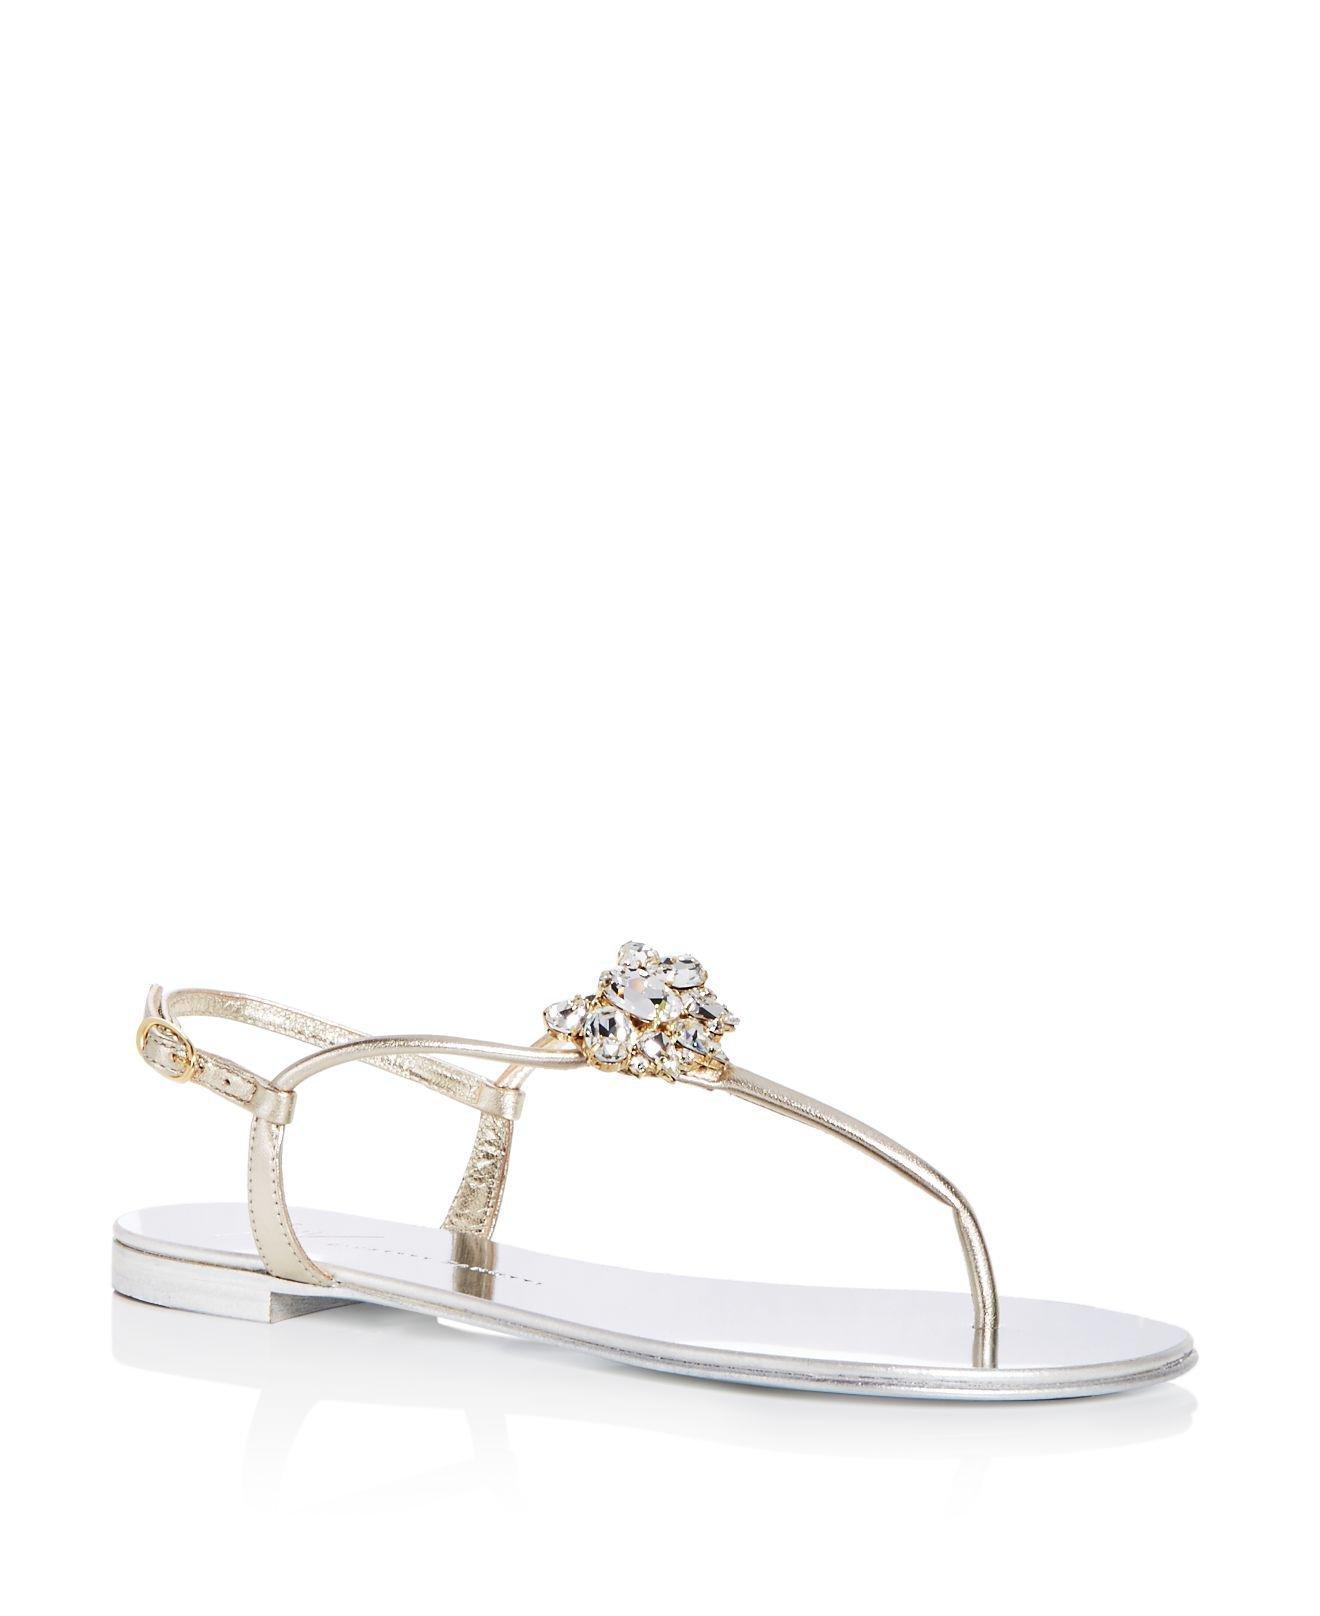 Giuseppe Zanotti Women's Nuvorock Swarovski Crystal Embellished Slide Sandals 3mVwVbzT